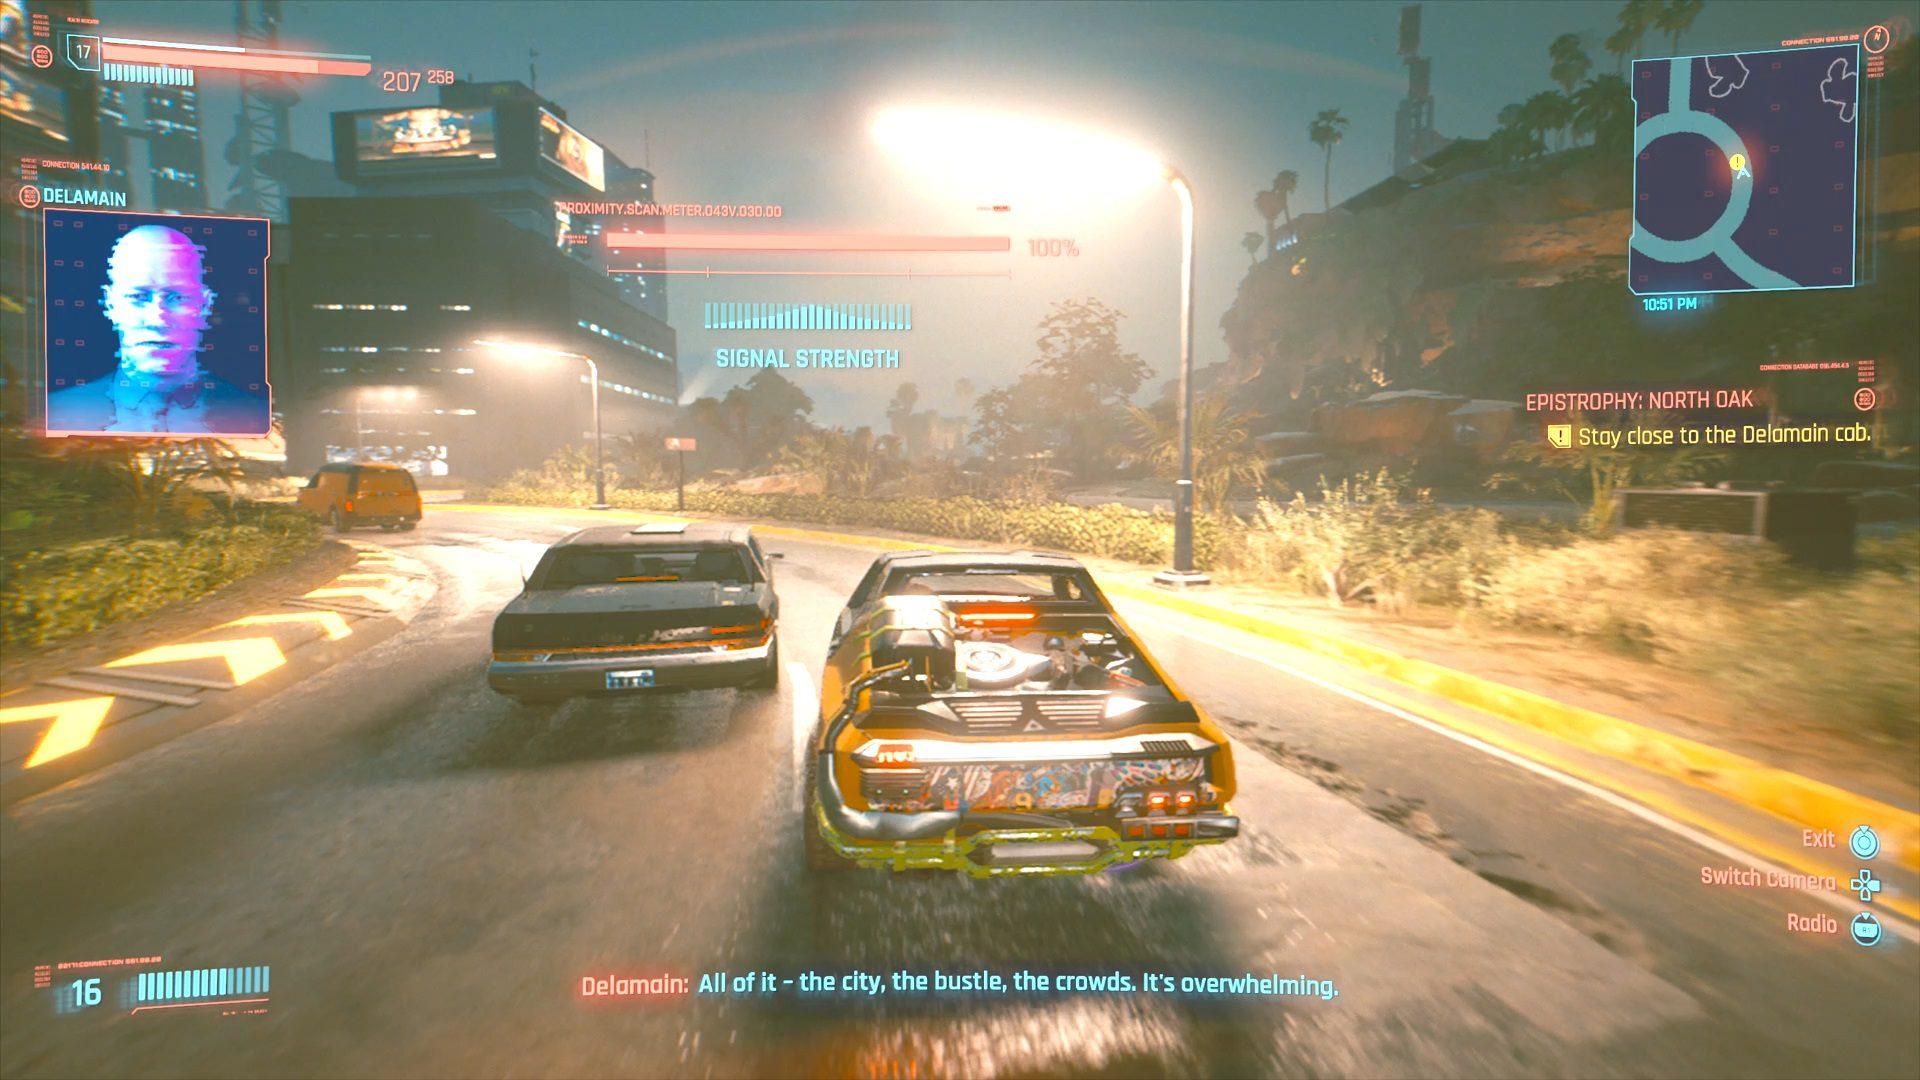 Cyberpunk 2077 North Oak Delamain Hidden Cab